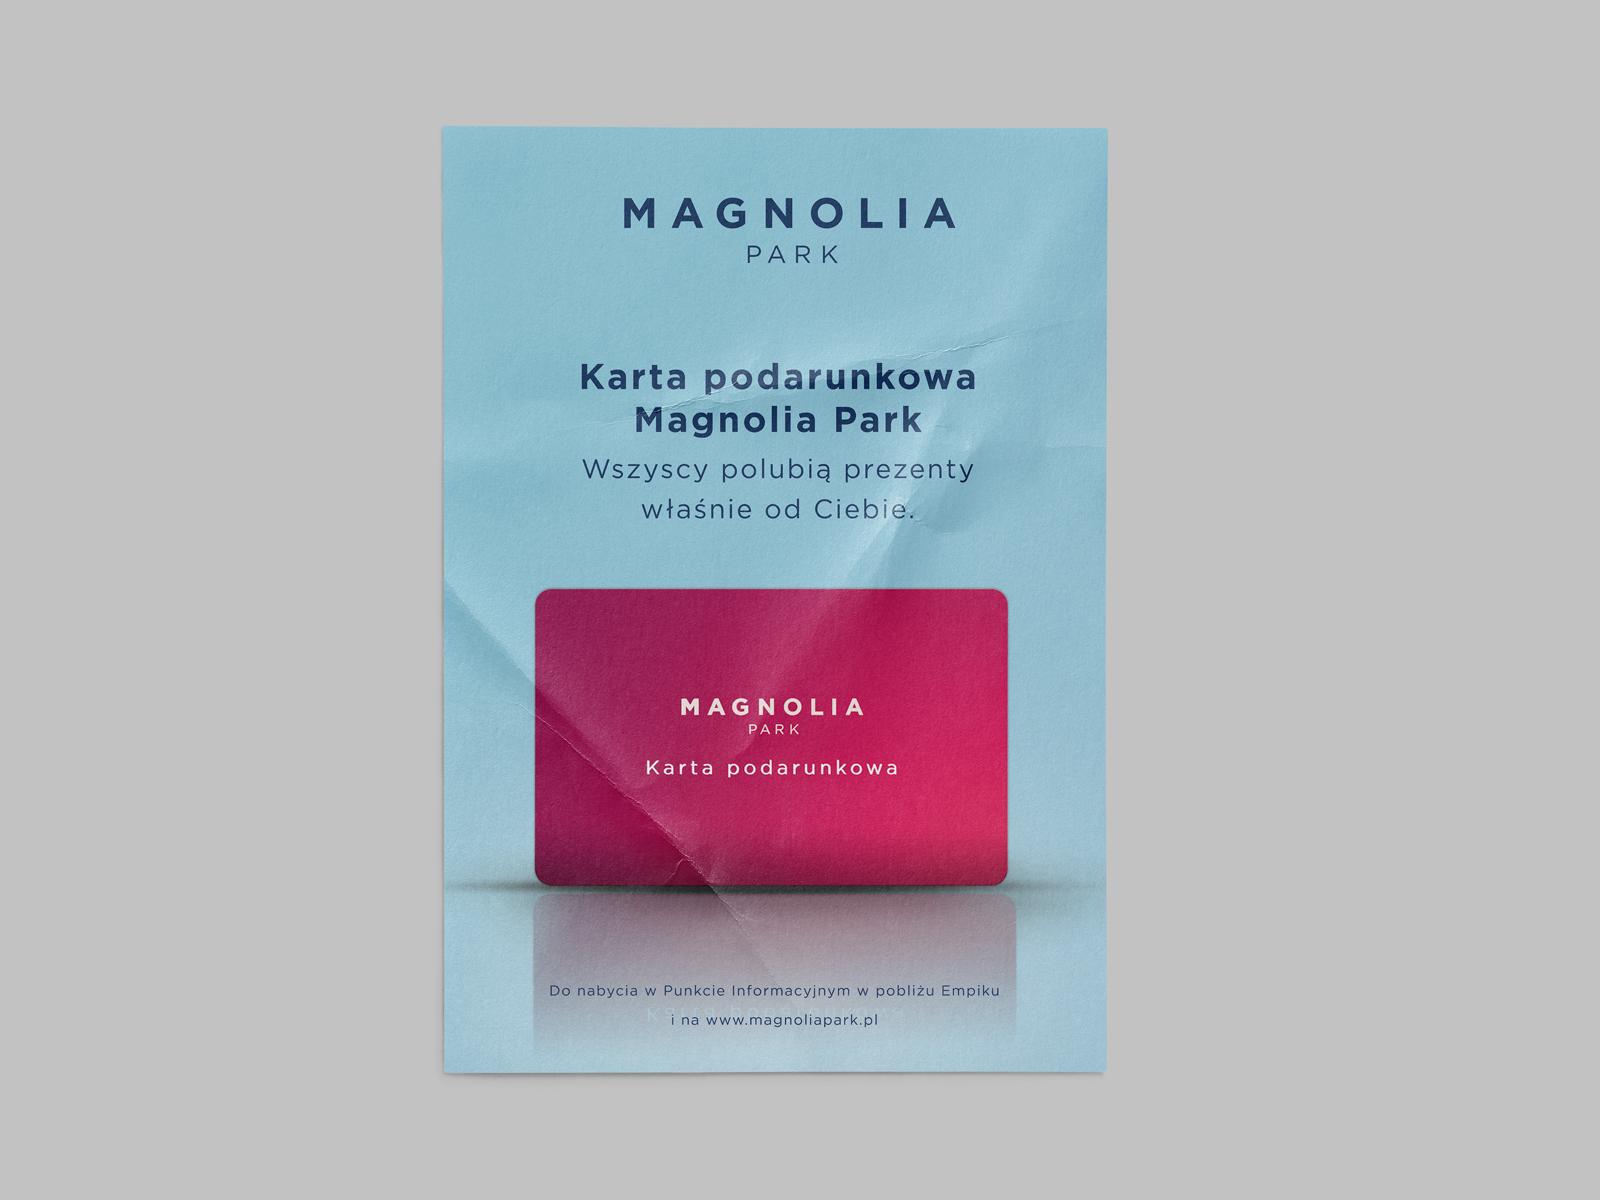 magnolia_new_3